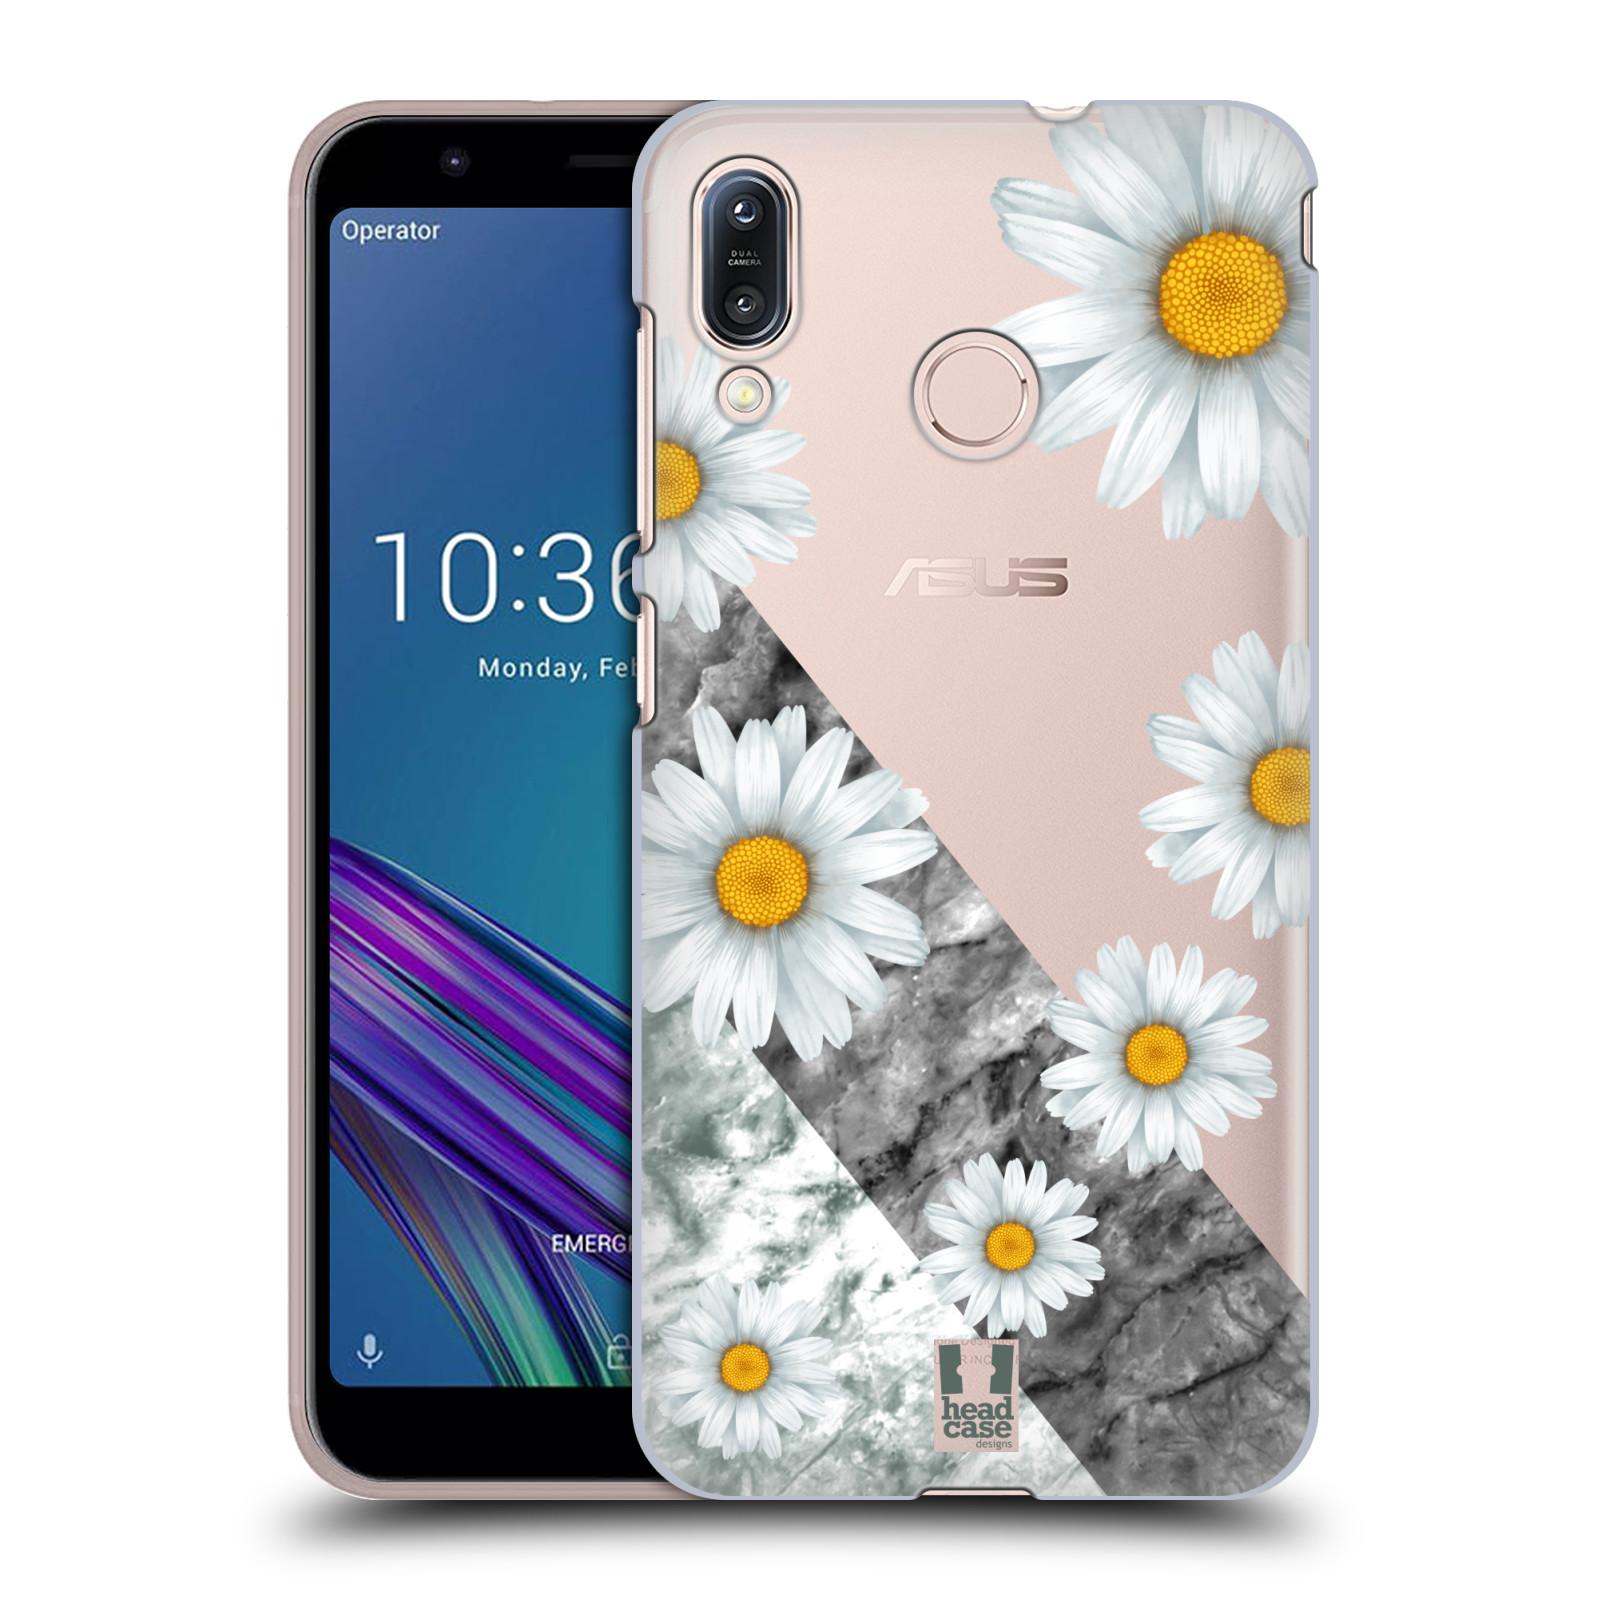 Pouzdro na mobil Asus Zenfone Max M1 (ZB555KL) - HEAD CASE - květina sedmikráska a mramor